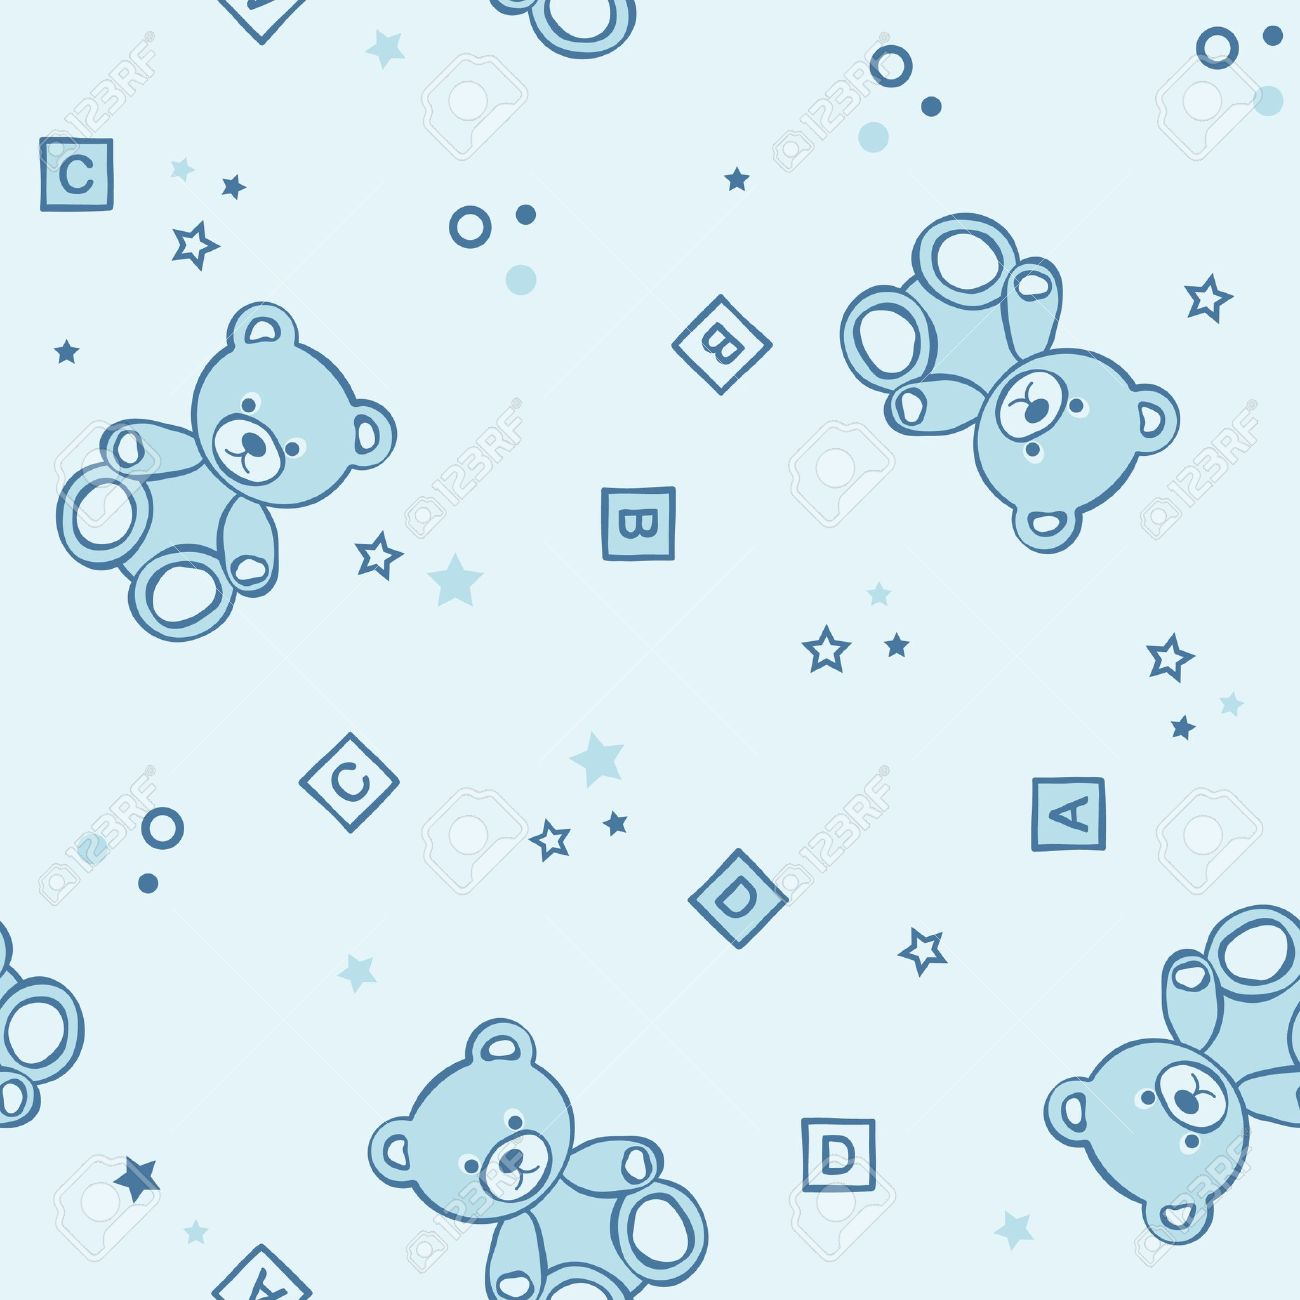 Teddy bears seamless background. Vector illustration. Stock Vector - 9400436